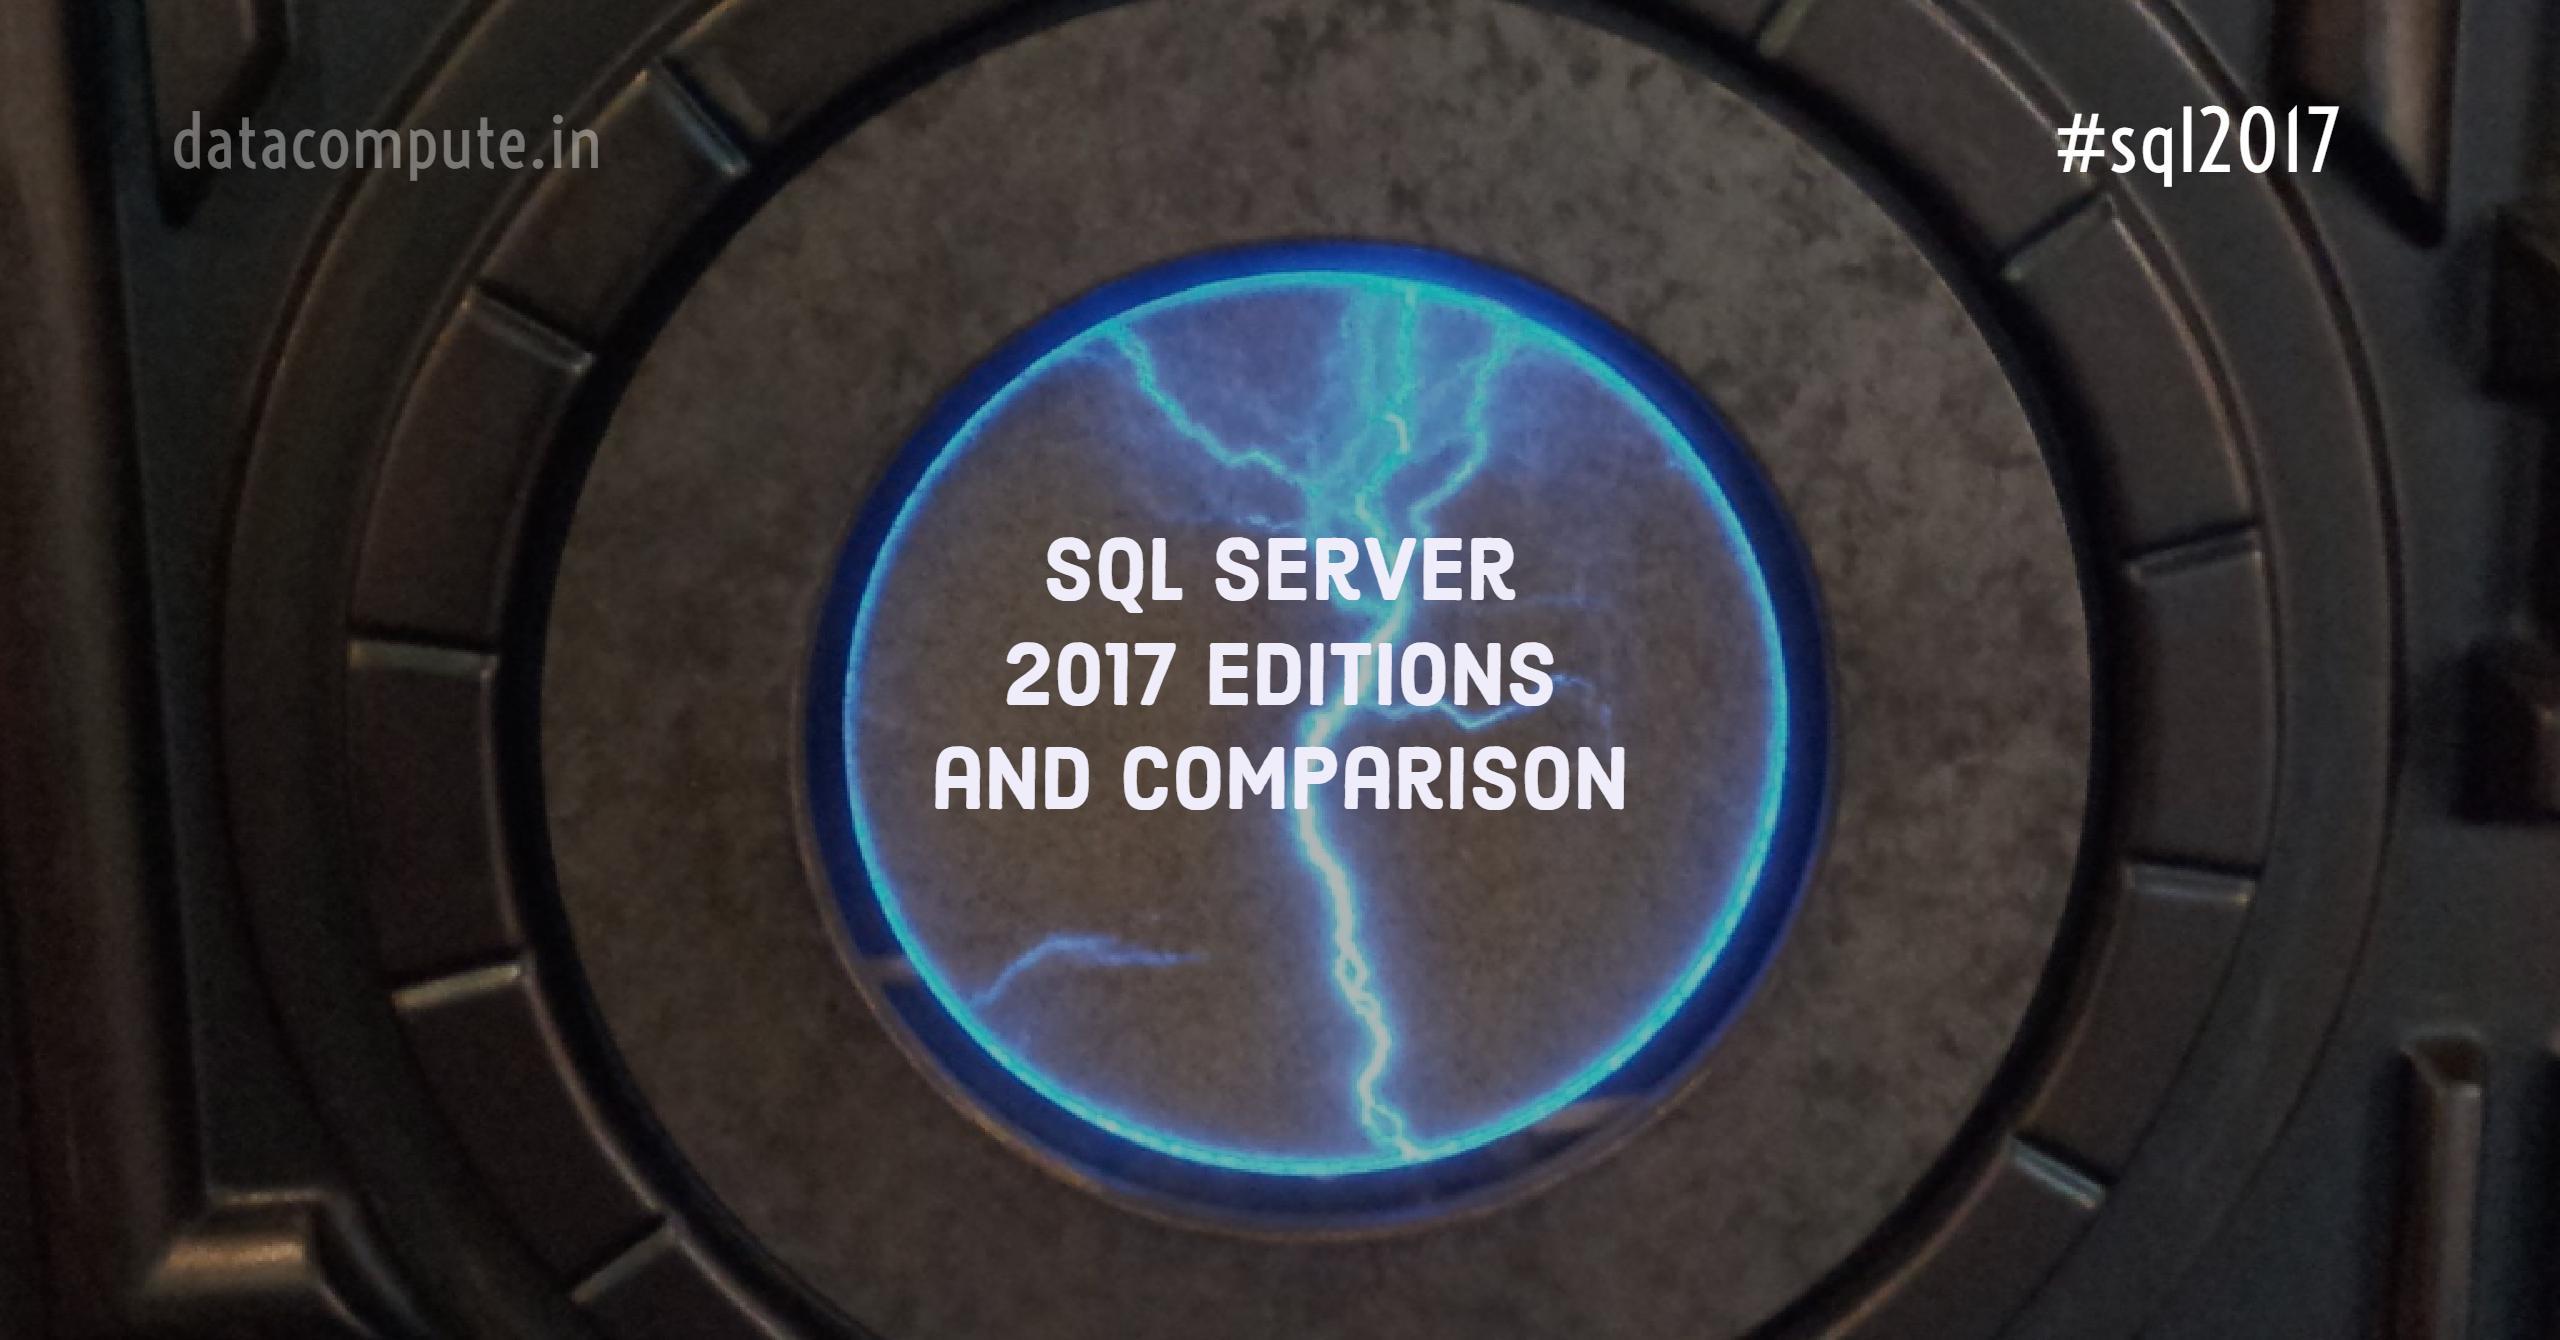 SQL Server 2017 Editions